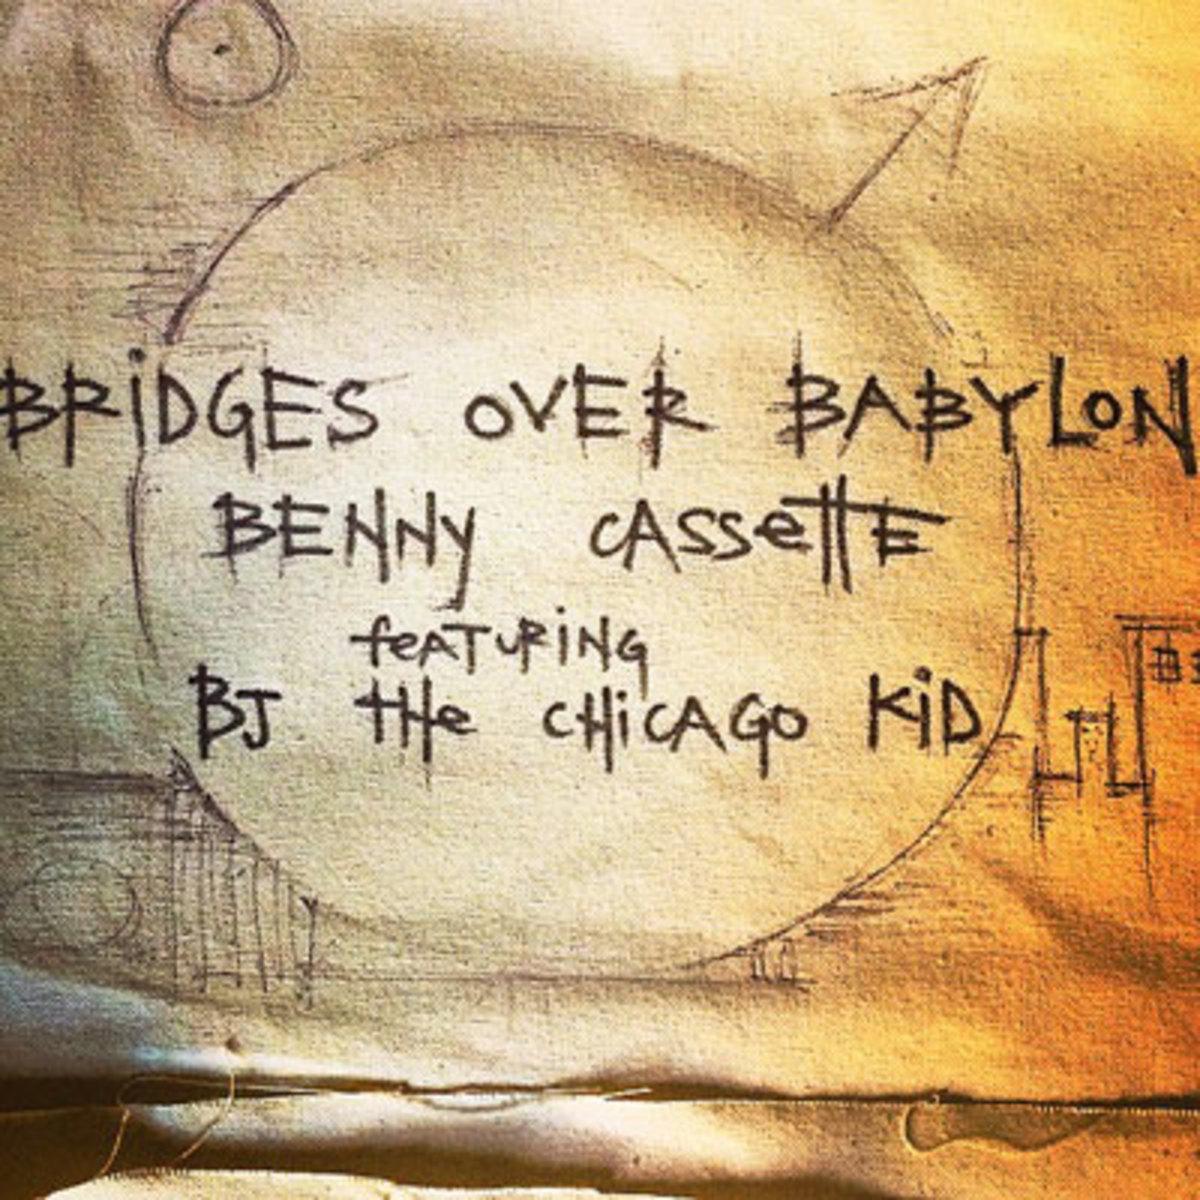 bennycassette-bridges.jpg